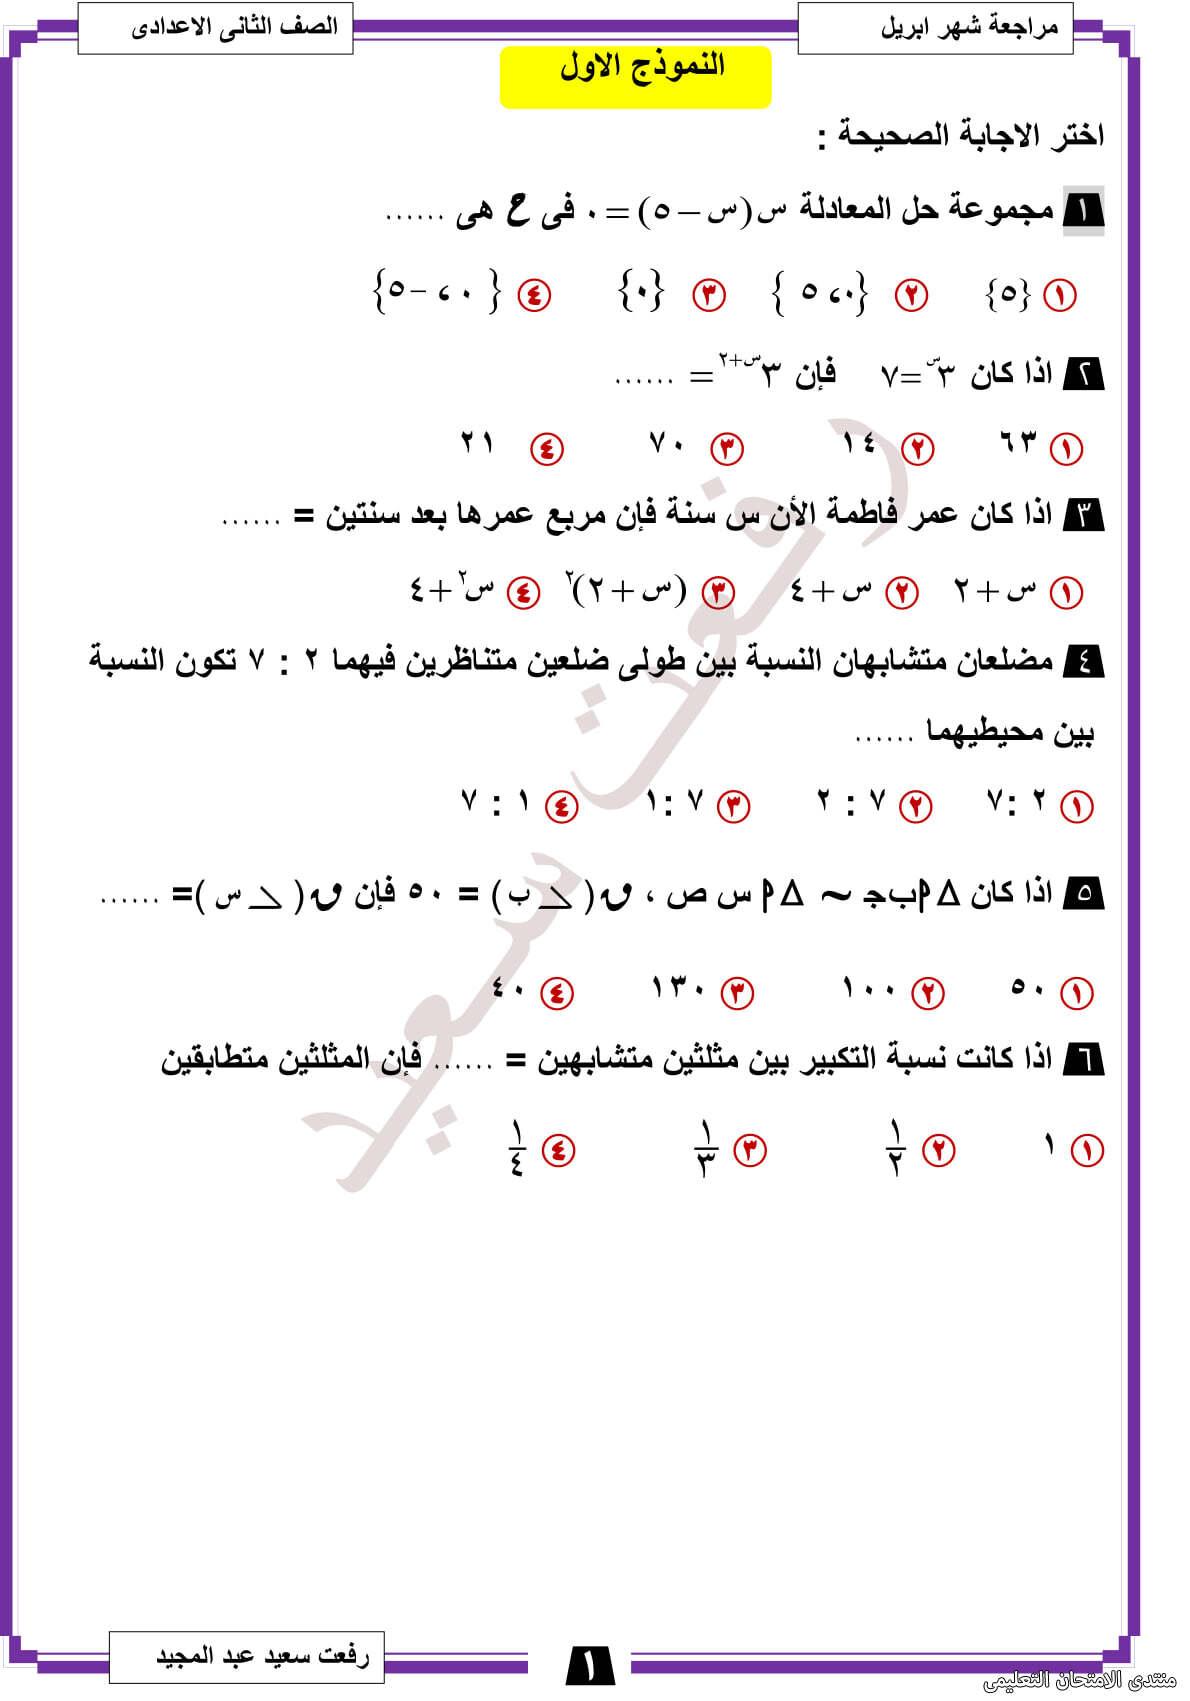 exam-eg.com_161904908731661.jpg